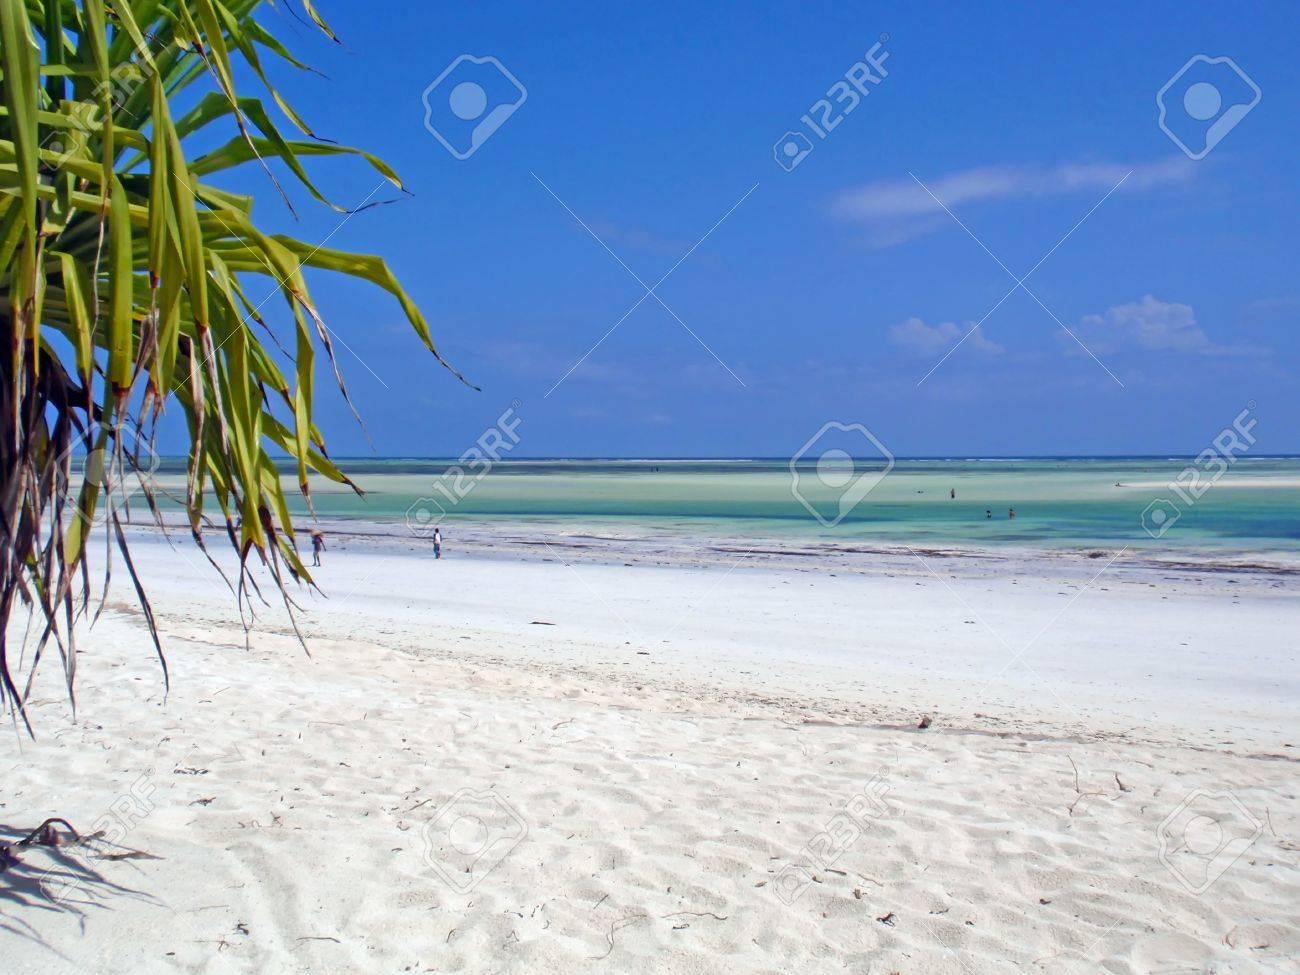 A deserted beach on the tropical island of Zanzibar. Stock Photo - 9629142